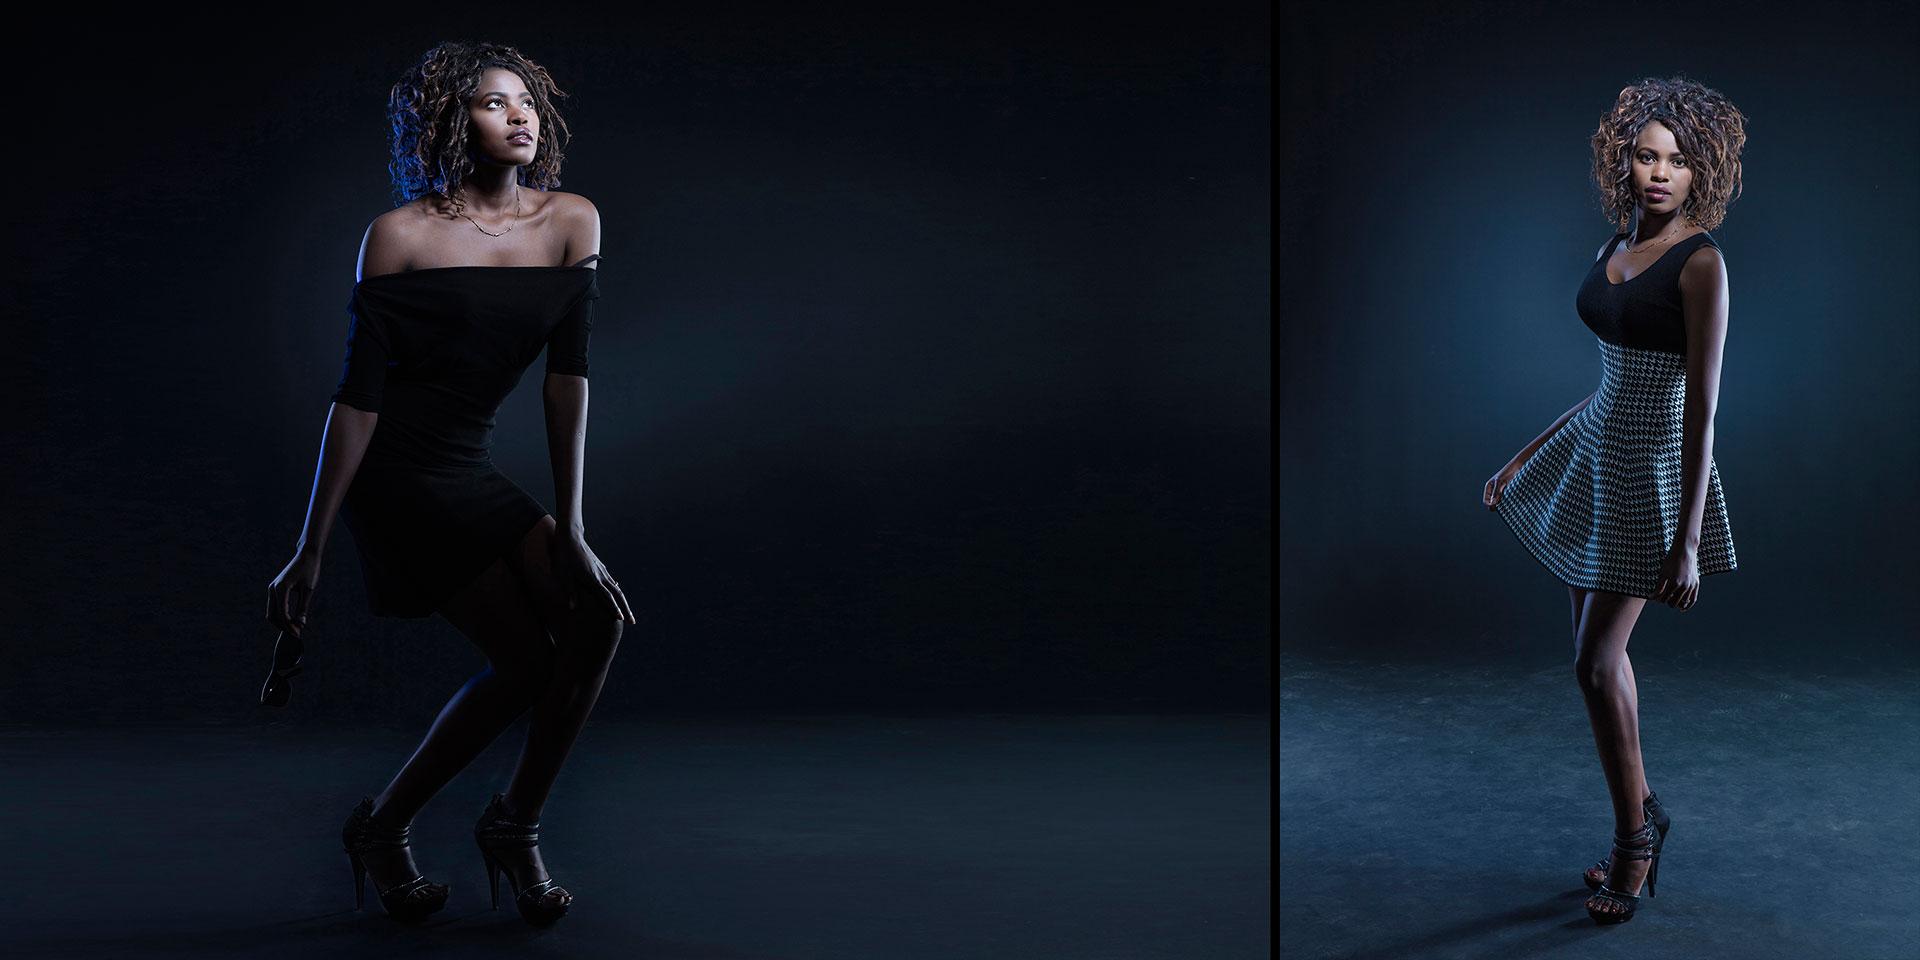 Fashionshooting Fotostudio Laackman